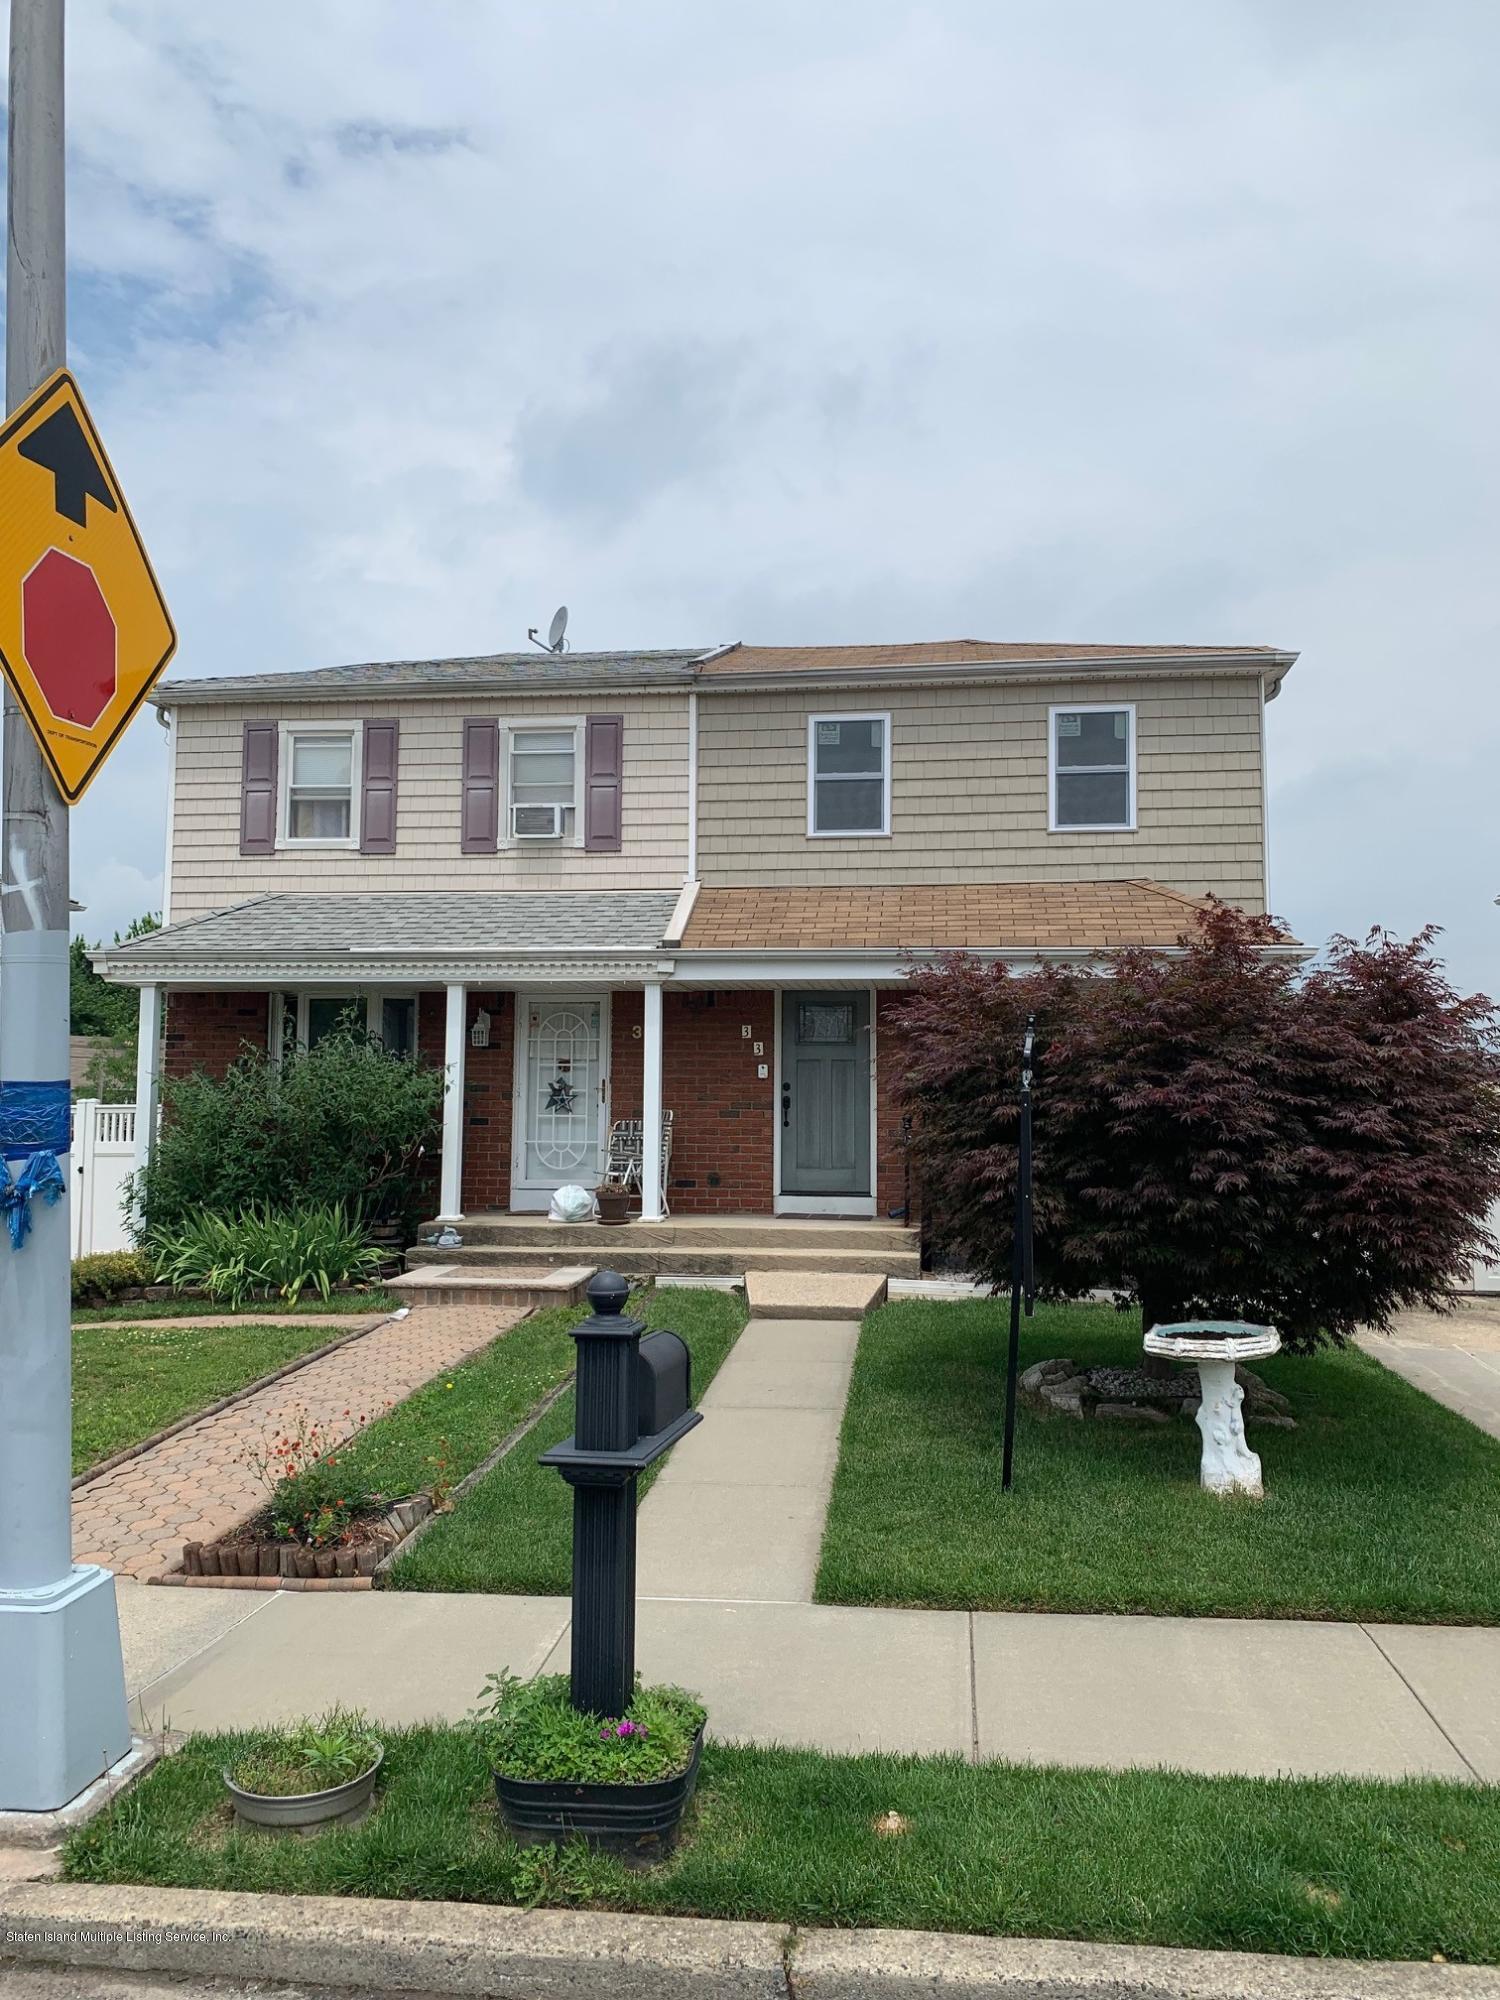 Single Family - Semi-Attached 33 Ibsen Avenue  Staten Island, NY 10312, MLS-1128335-2